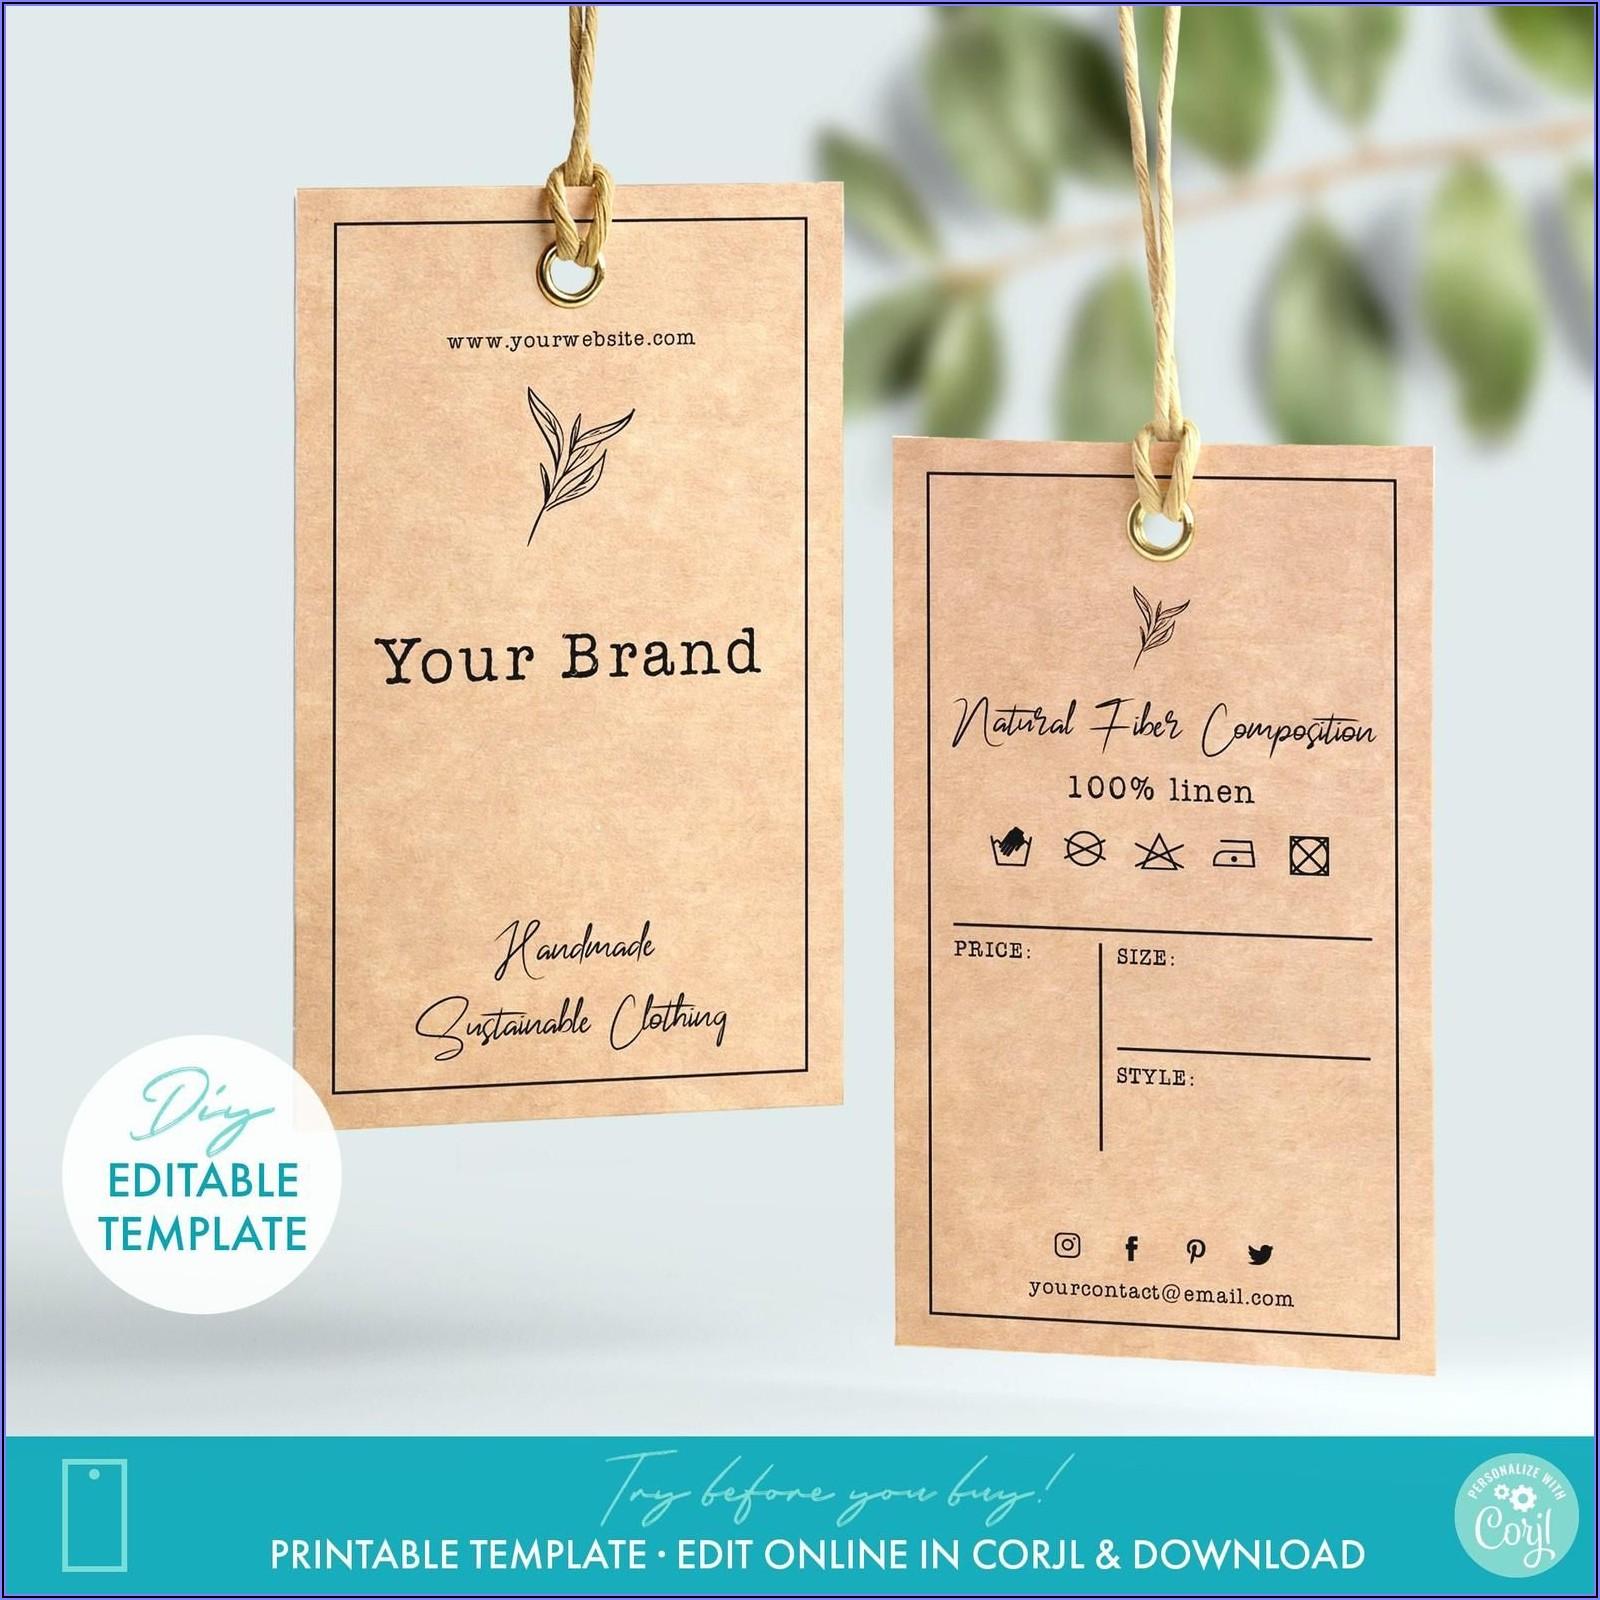 Printable Price Tags Template